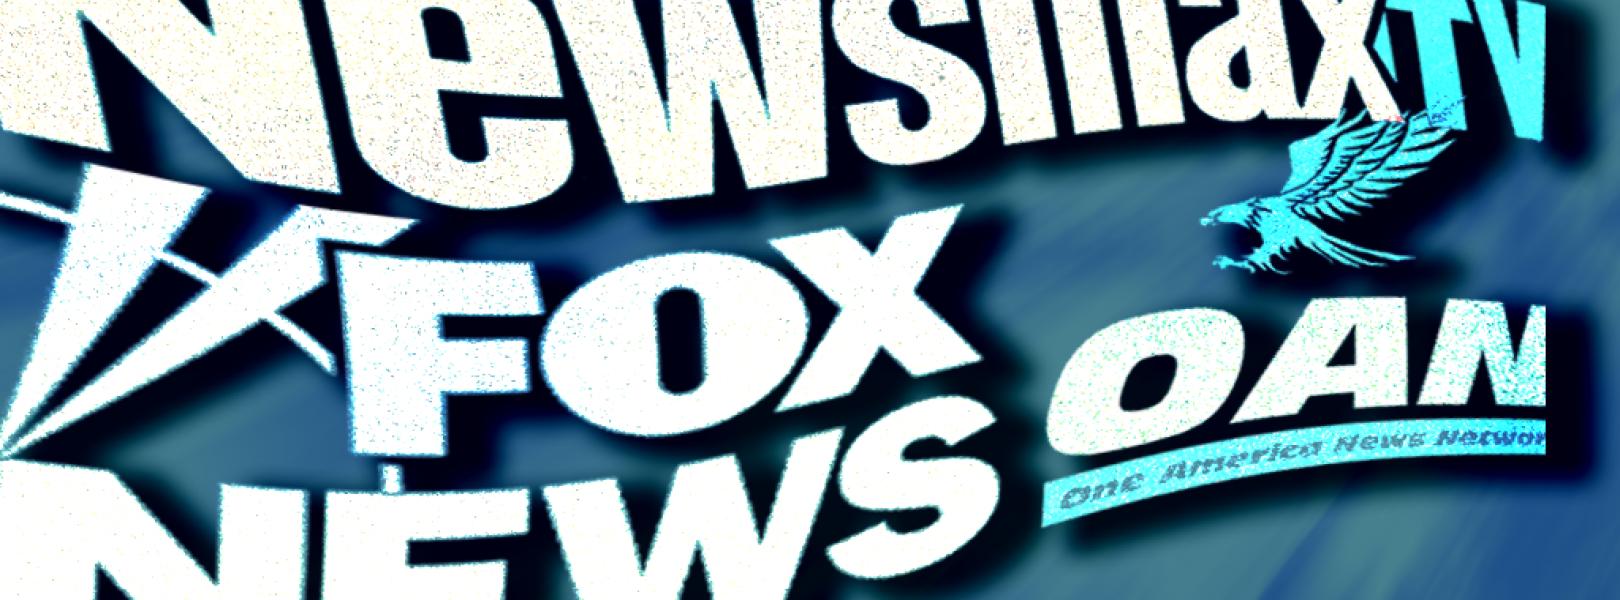 Newsmax TV, Fox News, and OAN logos